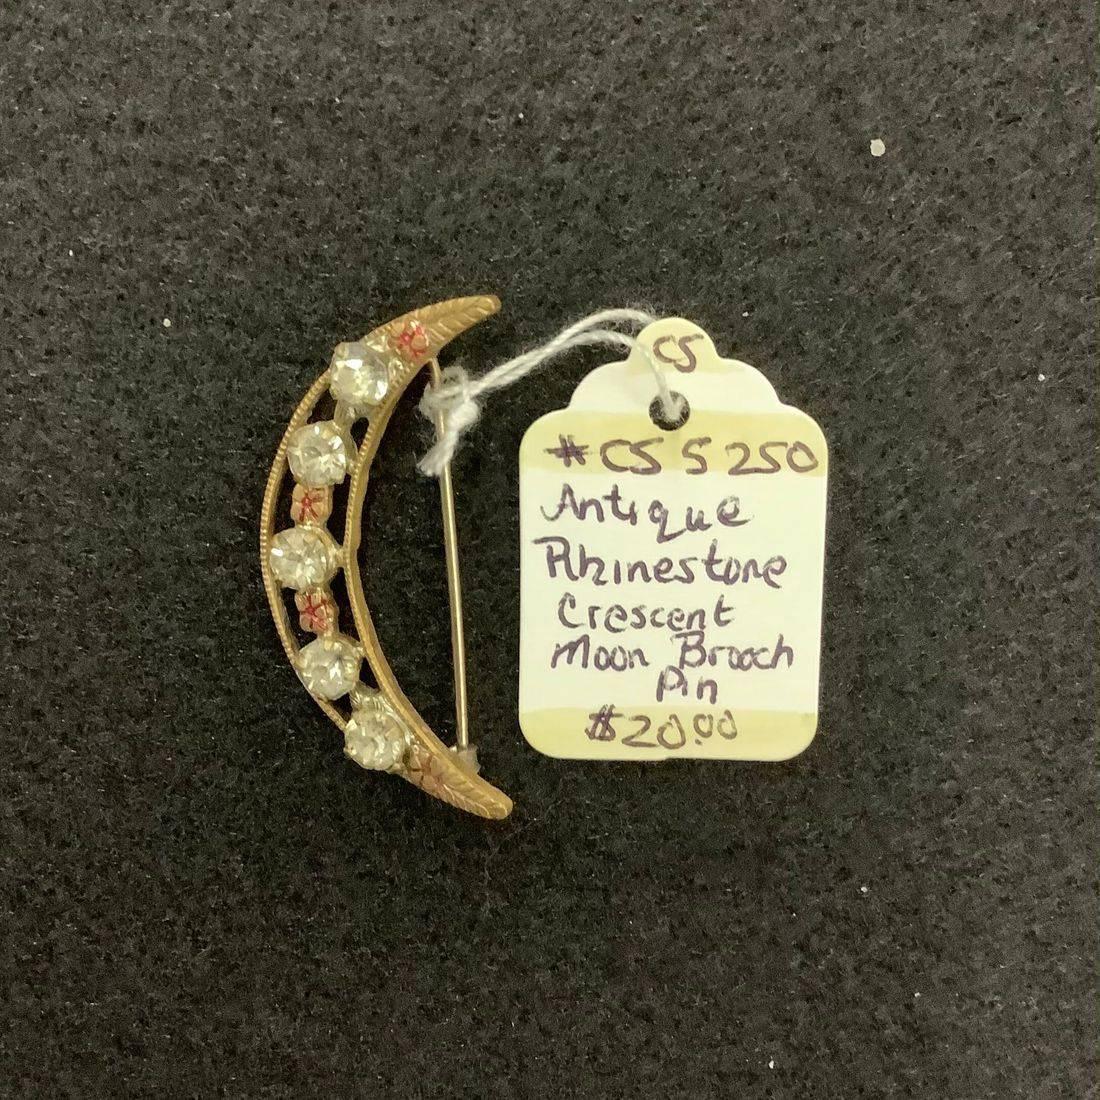 Antique Rhinestone Crescent Moon Brooch  $20.00